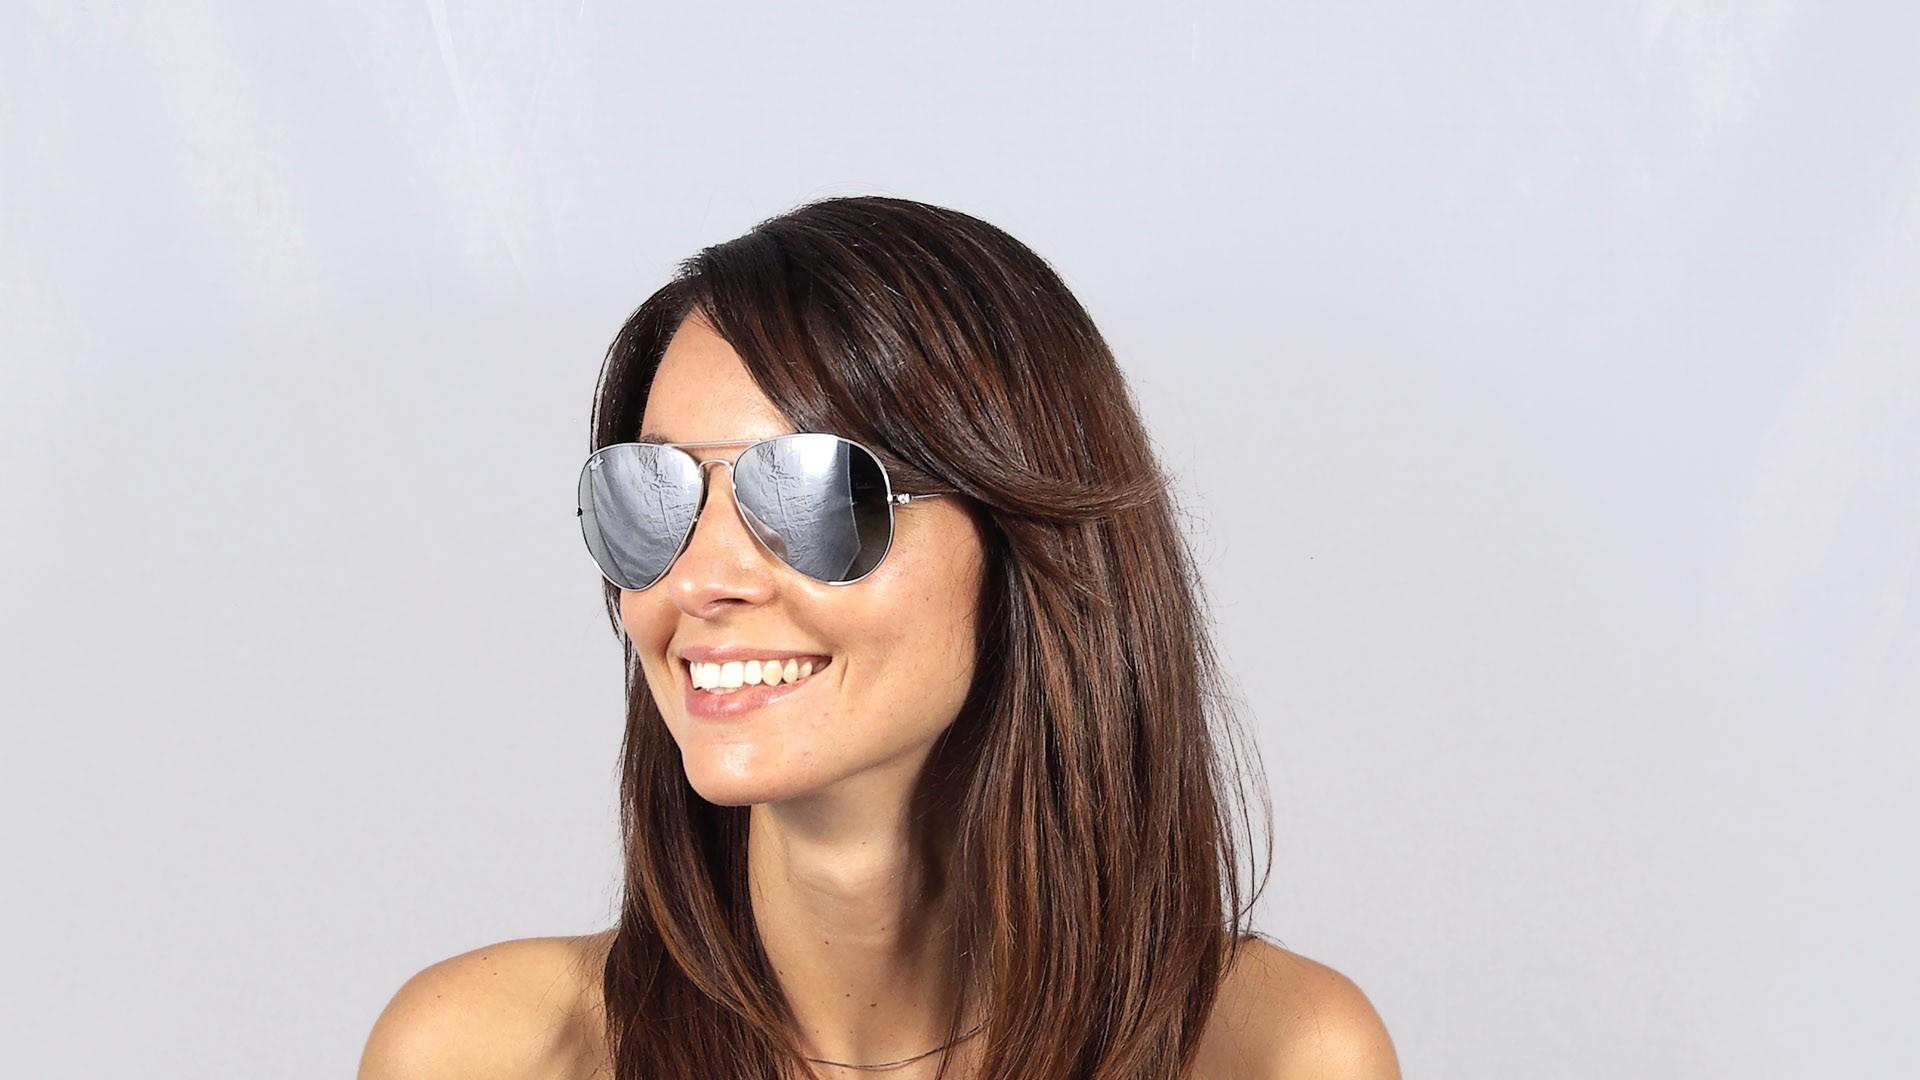 ray ban silver mirror large metal aviator sunglasses. Black Bedroom Furniture Sets. Home Design Ideas